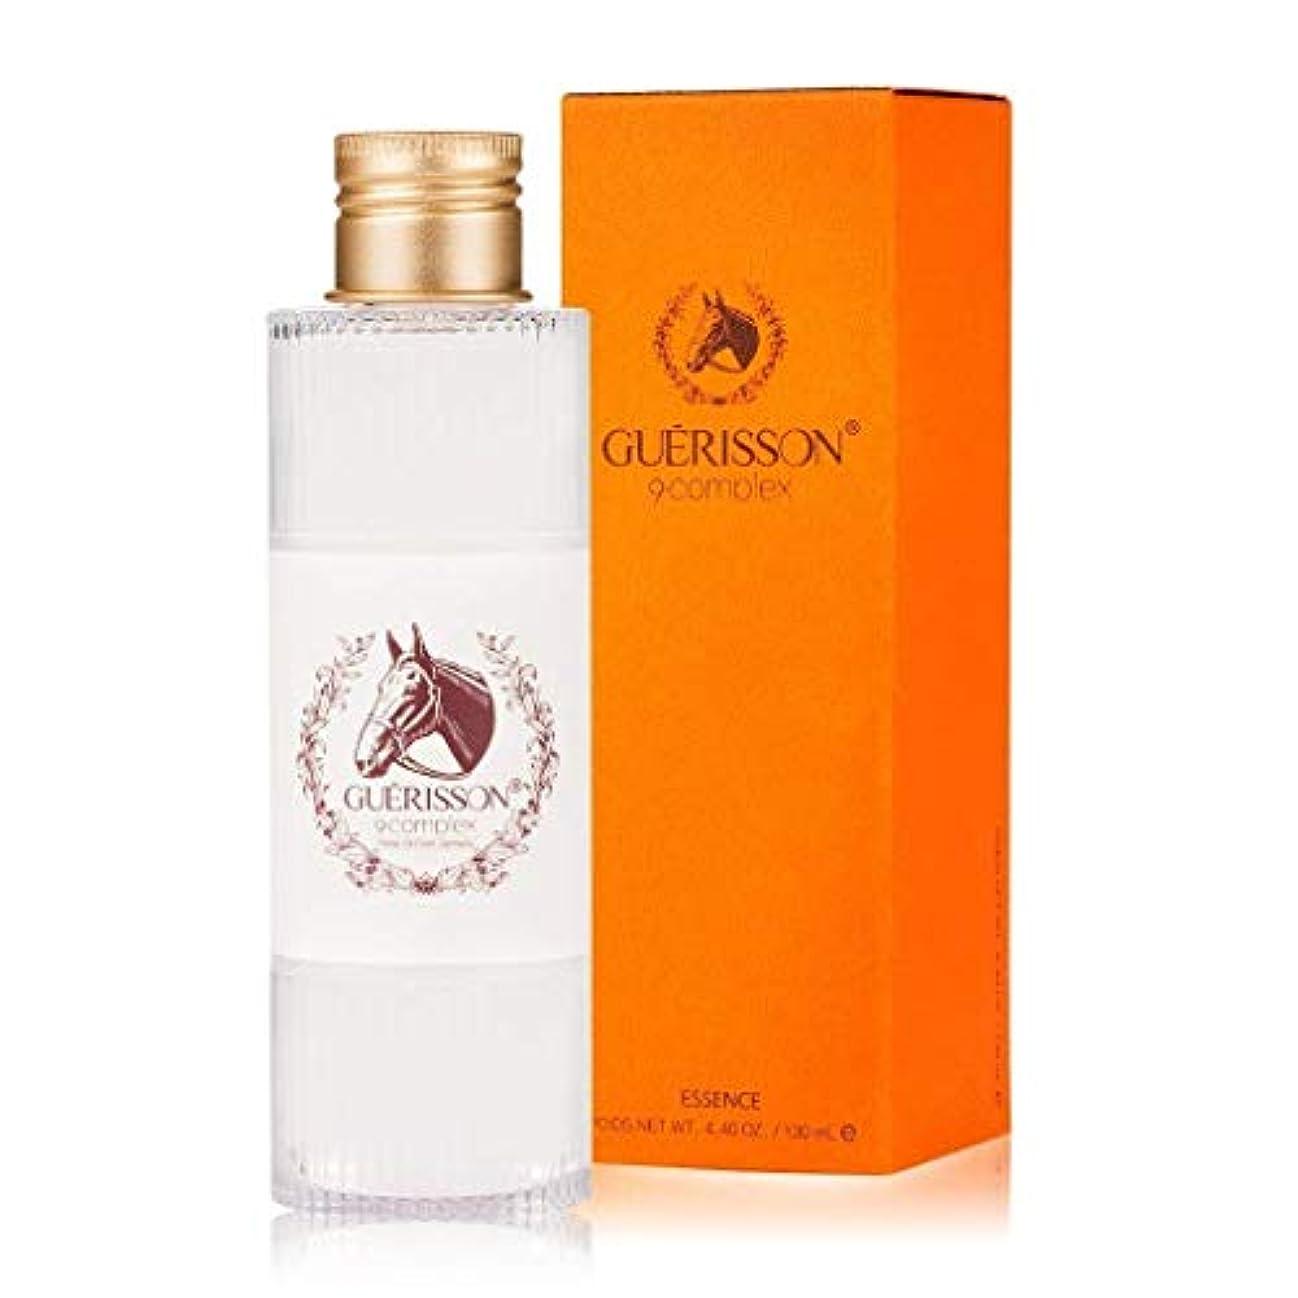 Guerisson 9 Complex Horse Oil Essence (Moisturizing Serum) 130ml(2019 Ver. Up)/Korea Cosmetics